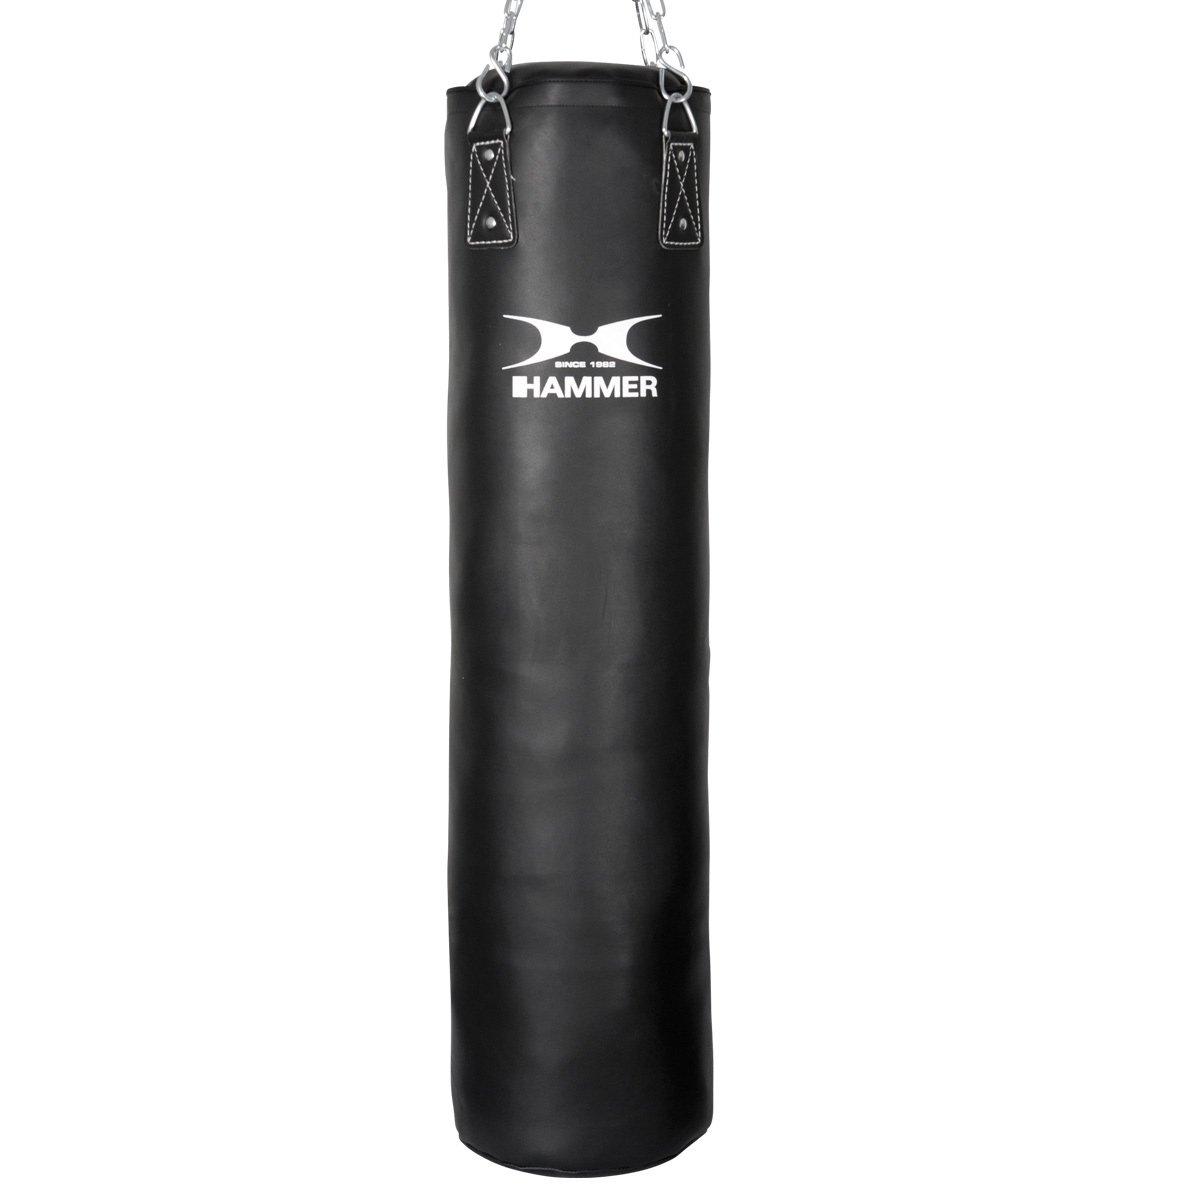 HAMMER BOXING Boxsack Premium Black Kick – Ideal für Box- und Kickbox-Training